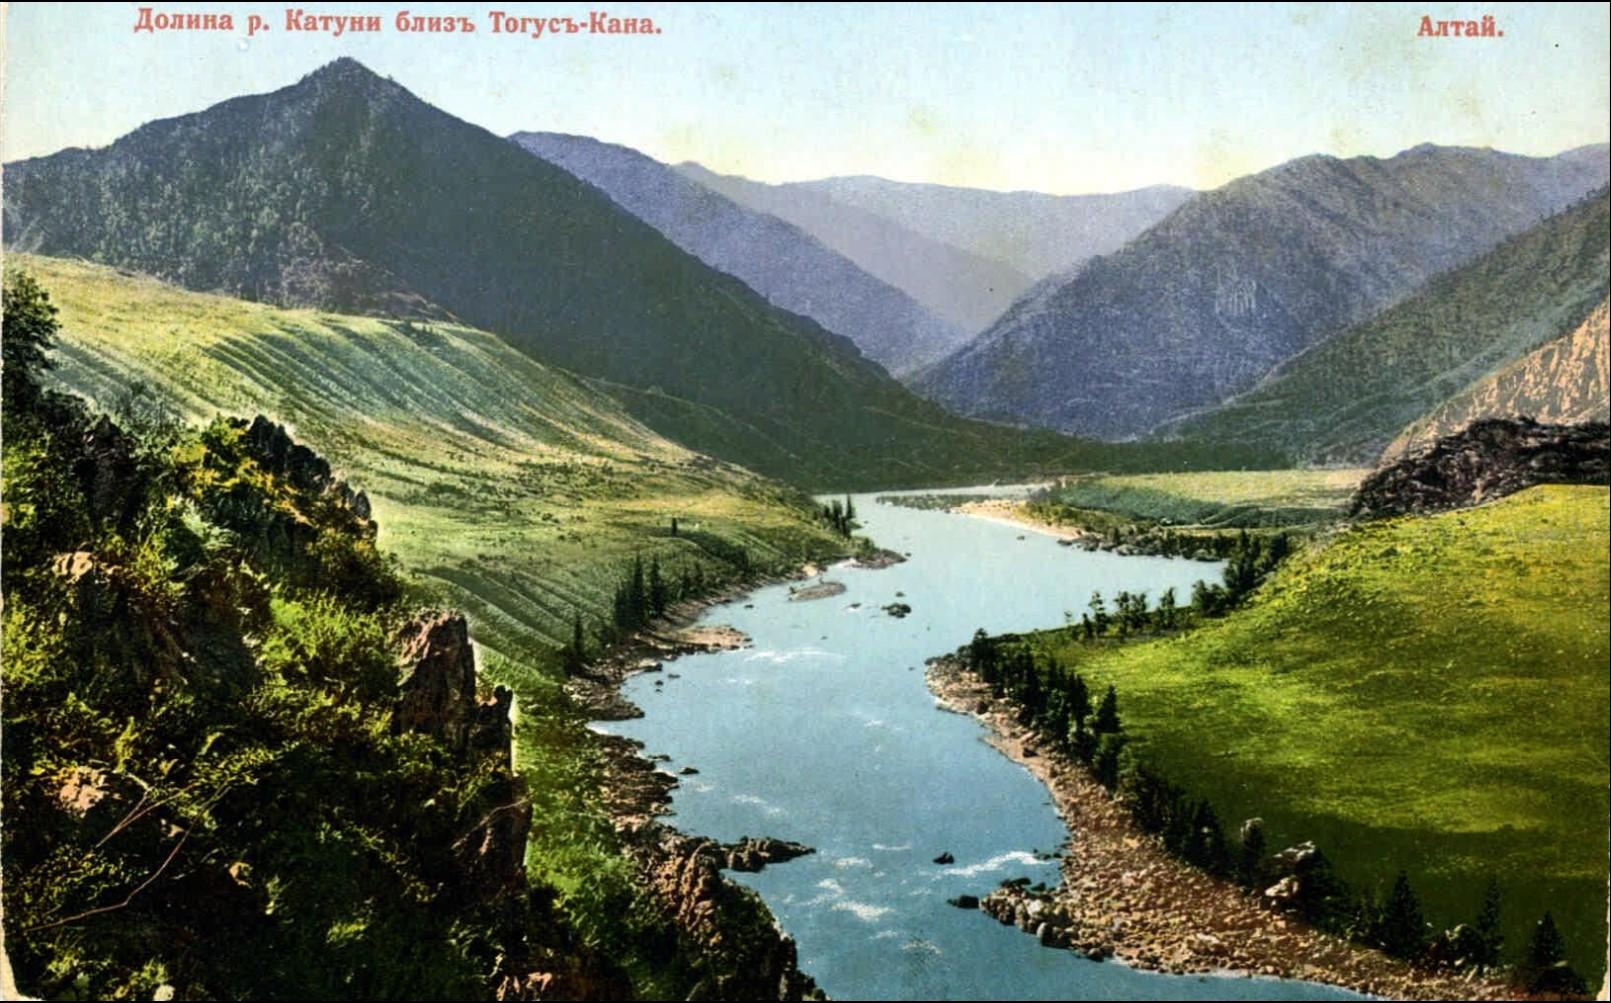 Долина р. Катуни близ Тогус-Кана